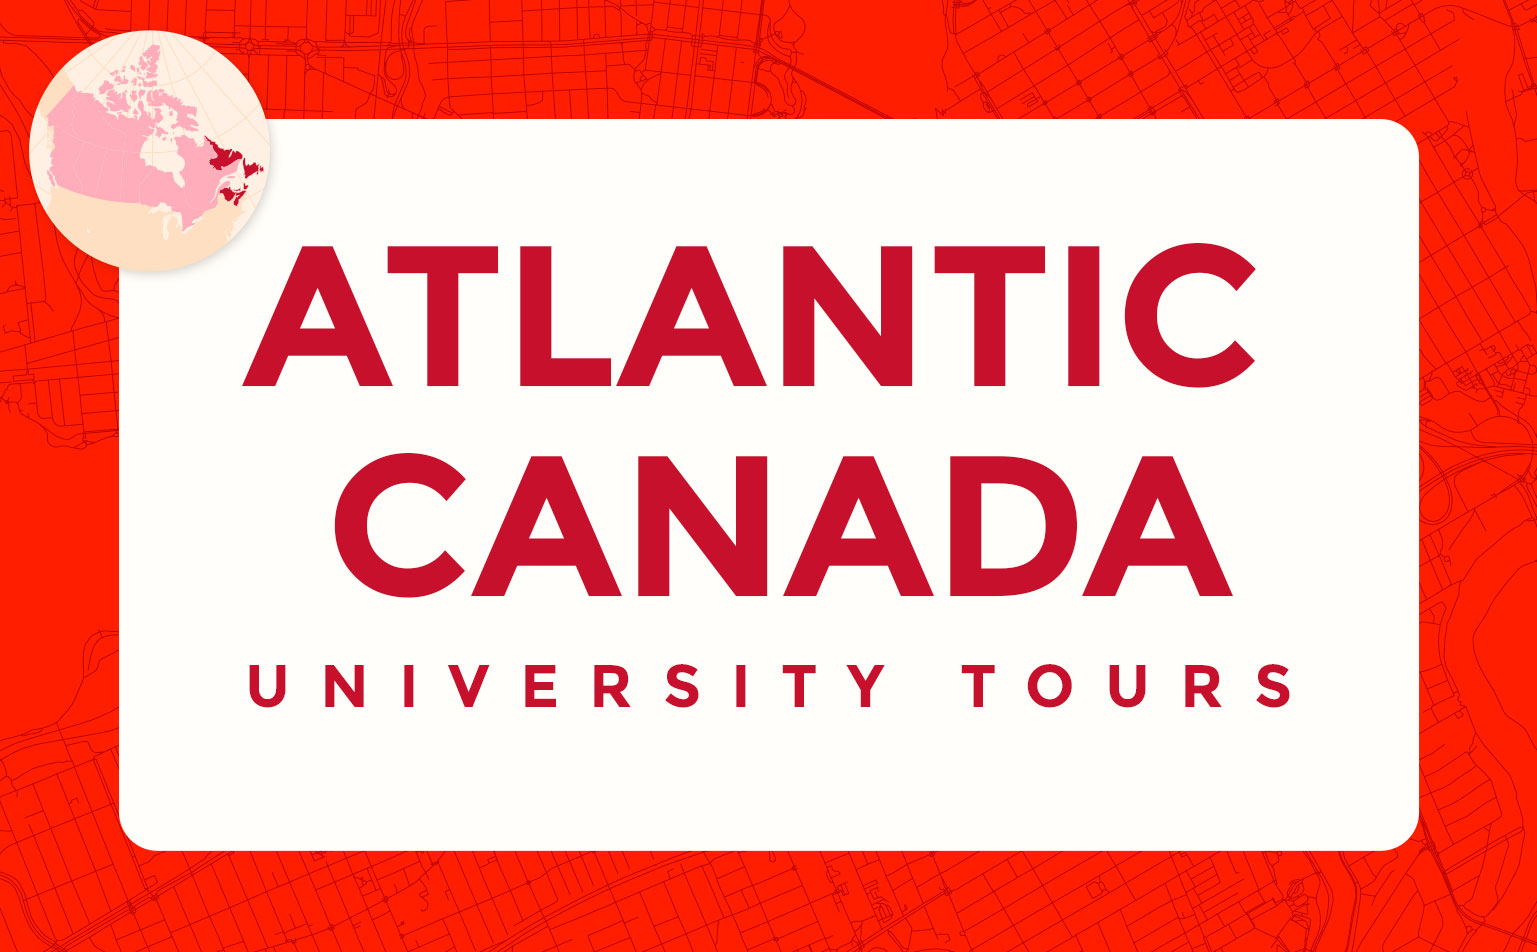 atlantic canada virtual campus university tours in new brunswick newfoundland nova scotia pei